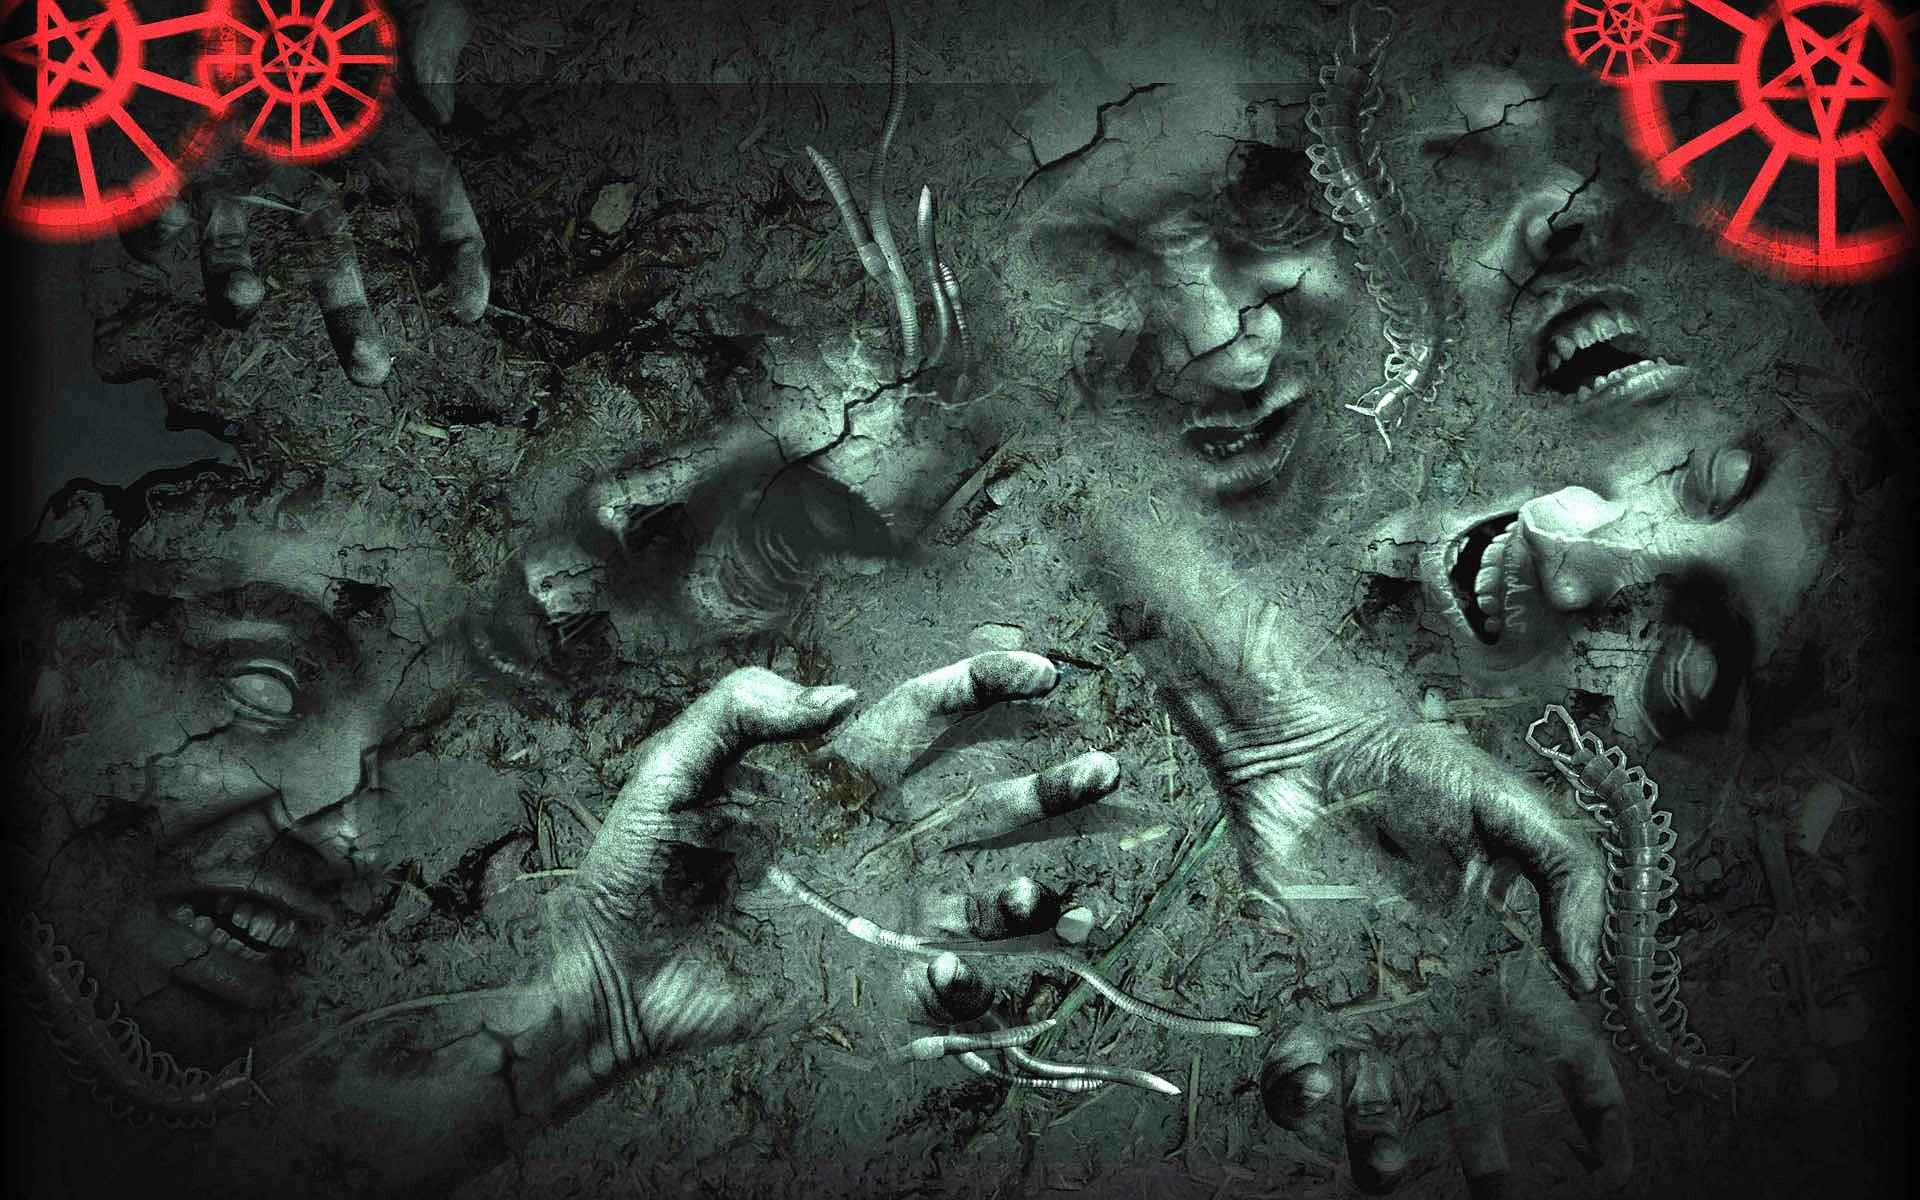 NAZI ZOMBIE ARMY TRILOGY survival horror shooter dar action 1zatrilogy 1920x1200